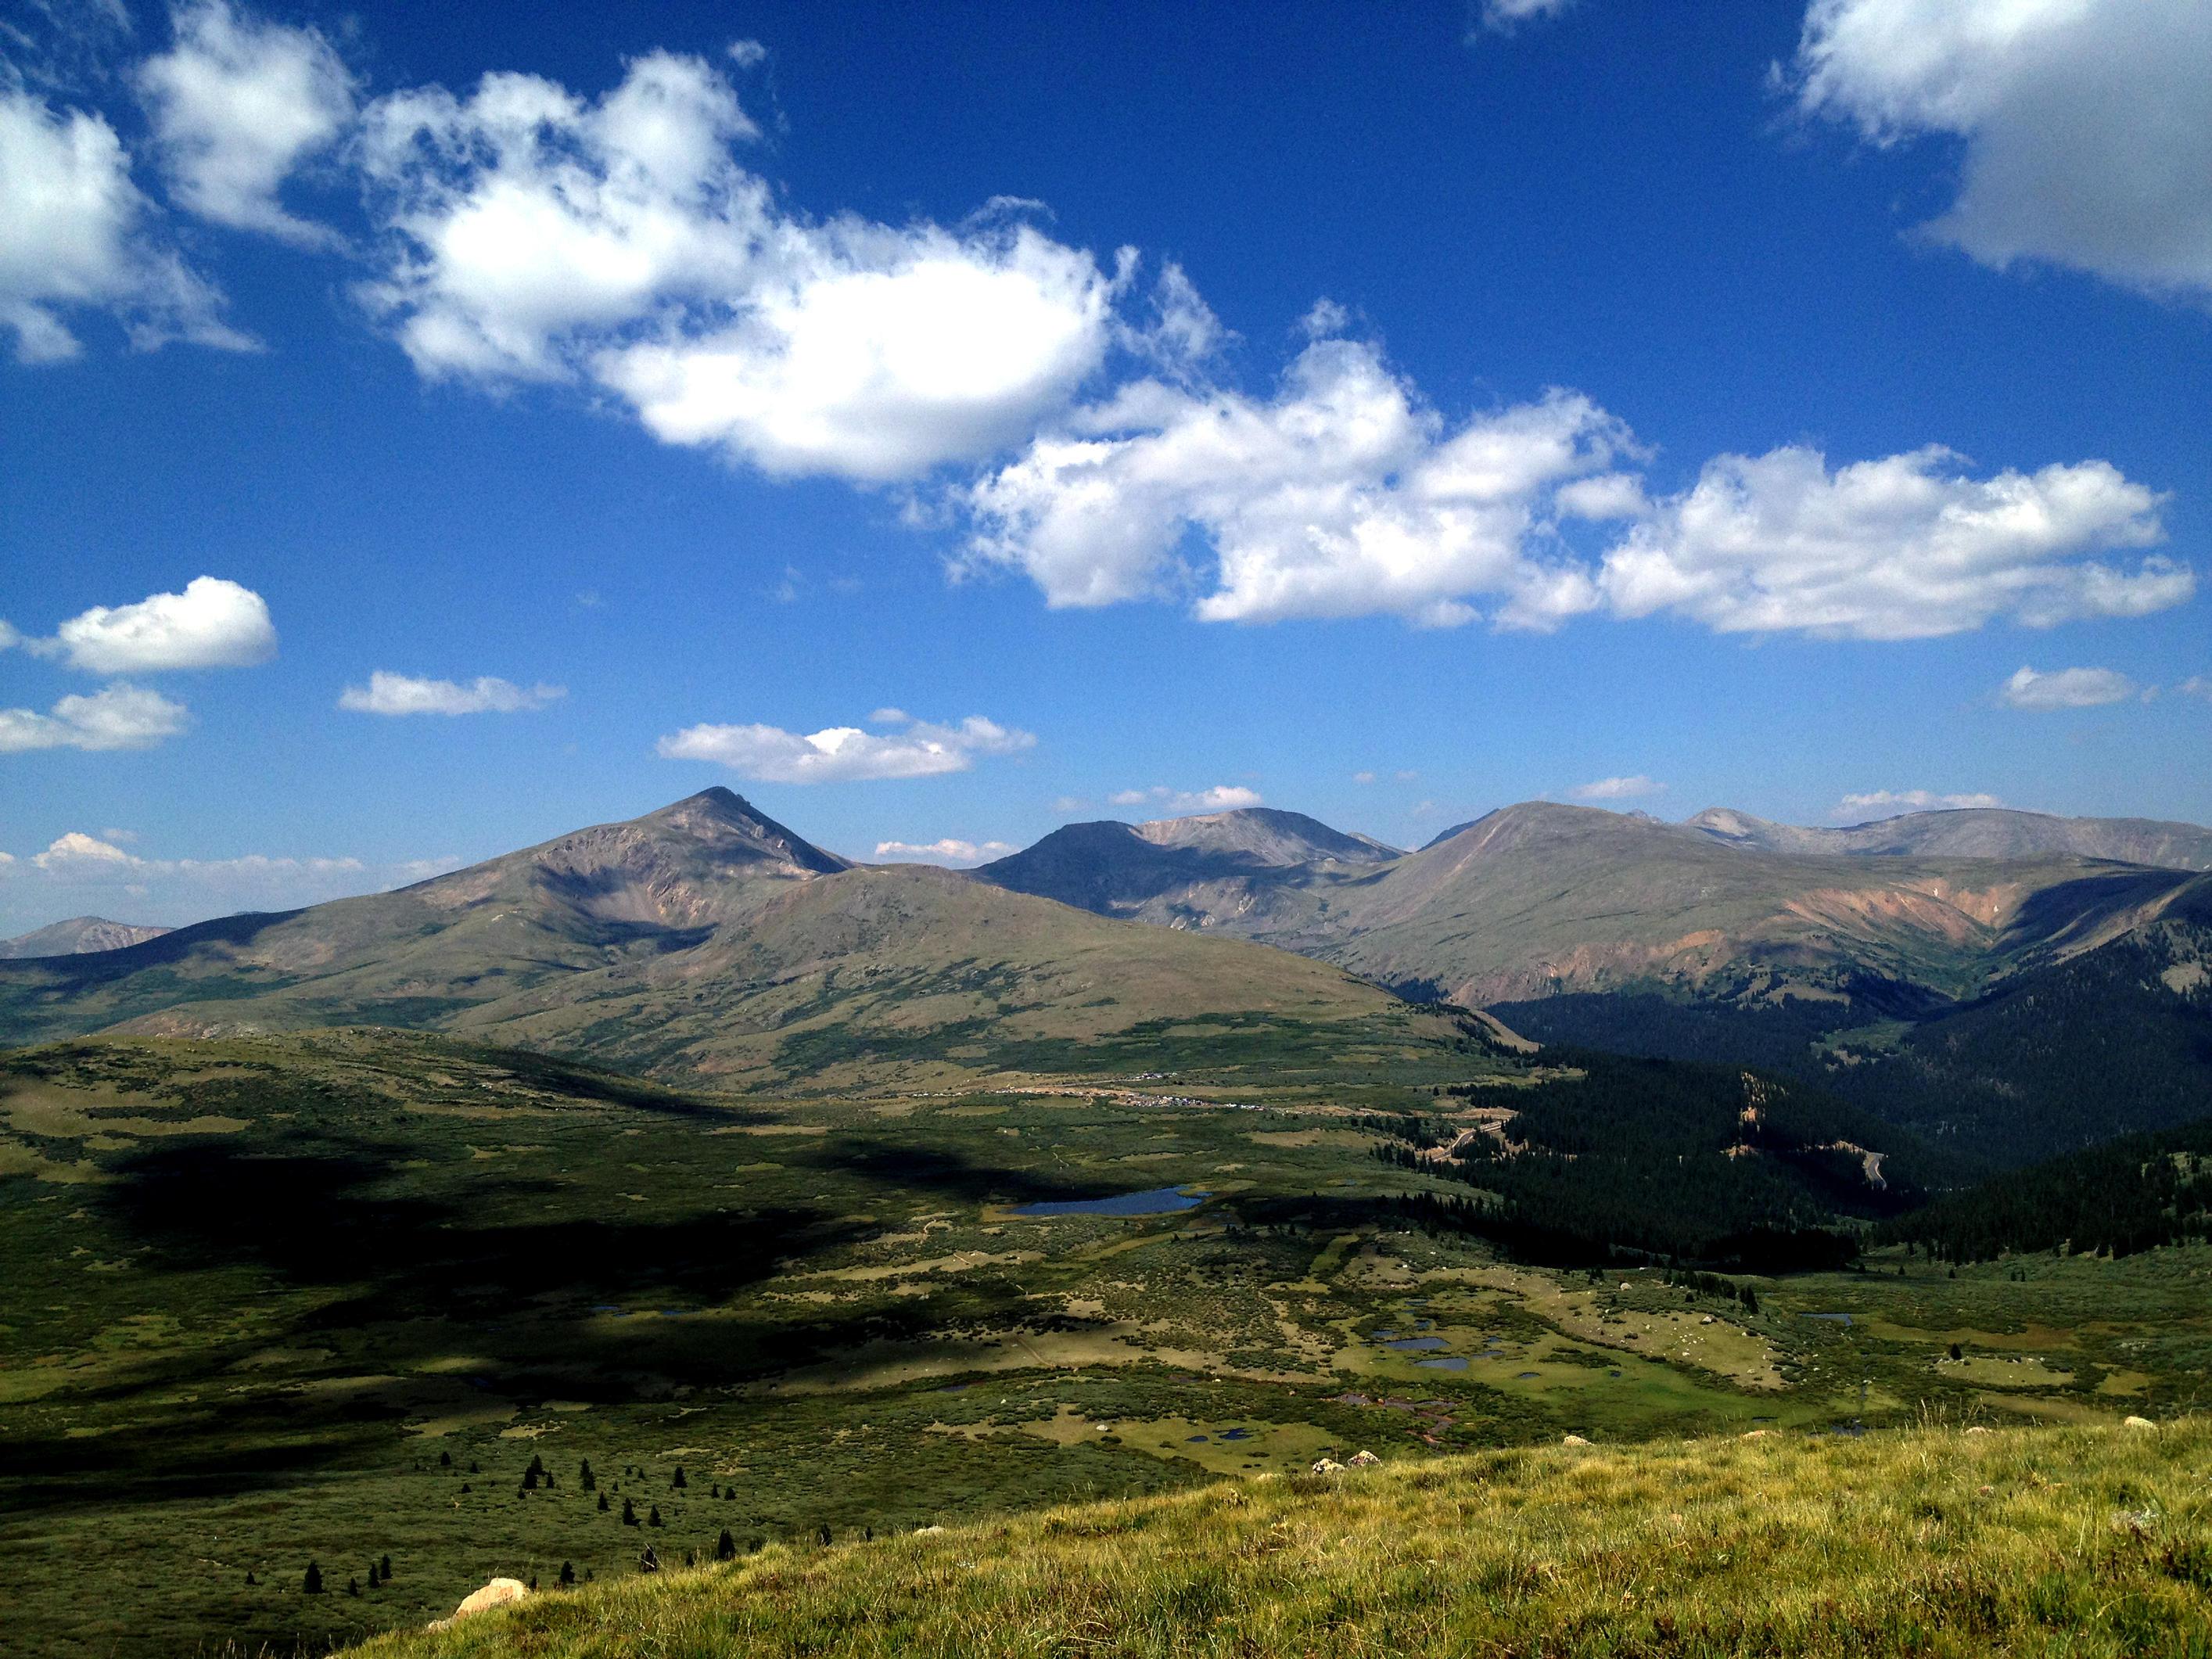 Climbing Mount Bierstadt by satsui